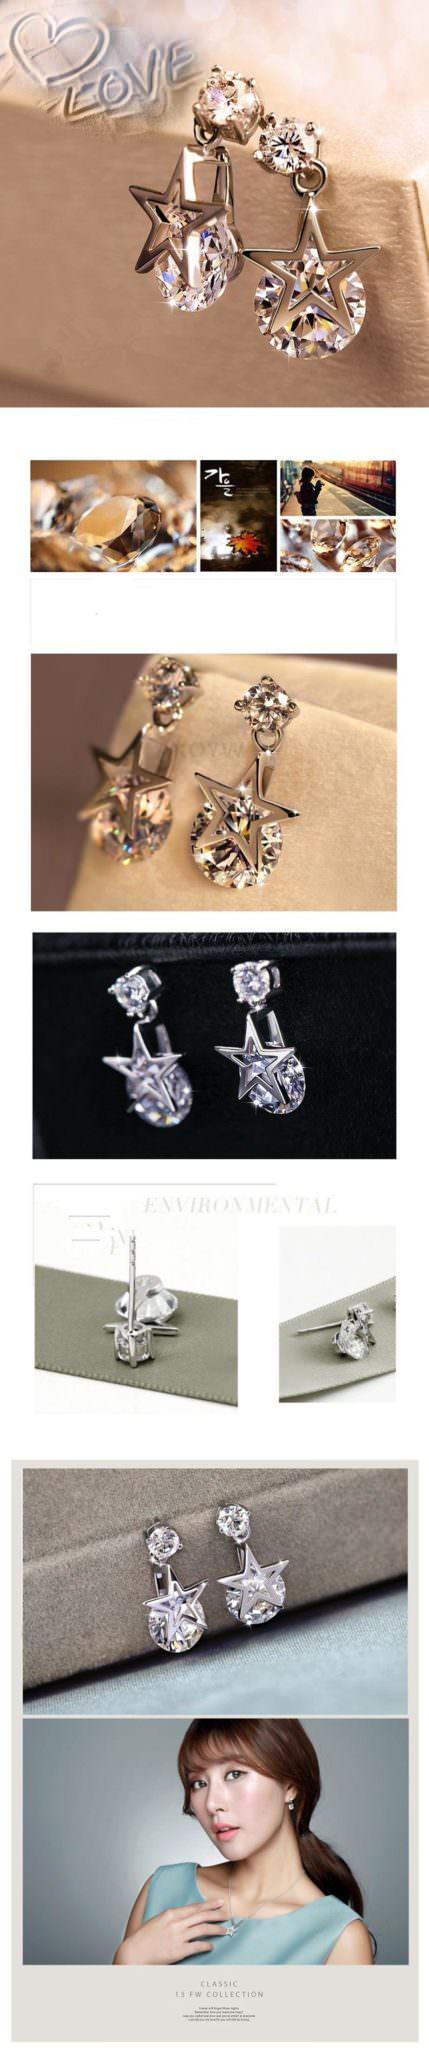 11578-a01764479cbe6e53fbff399ed0875bbc 2016 Ms Crystal Pentagram Cubic Zirconia Fashion Jewelry Earrings